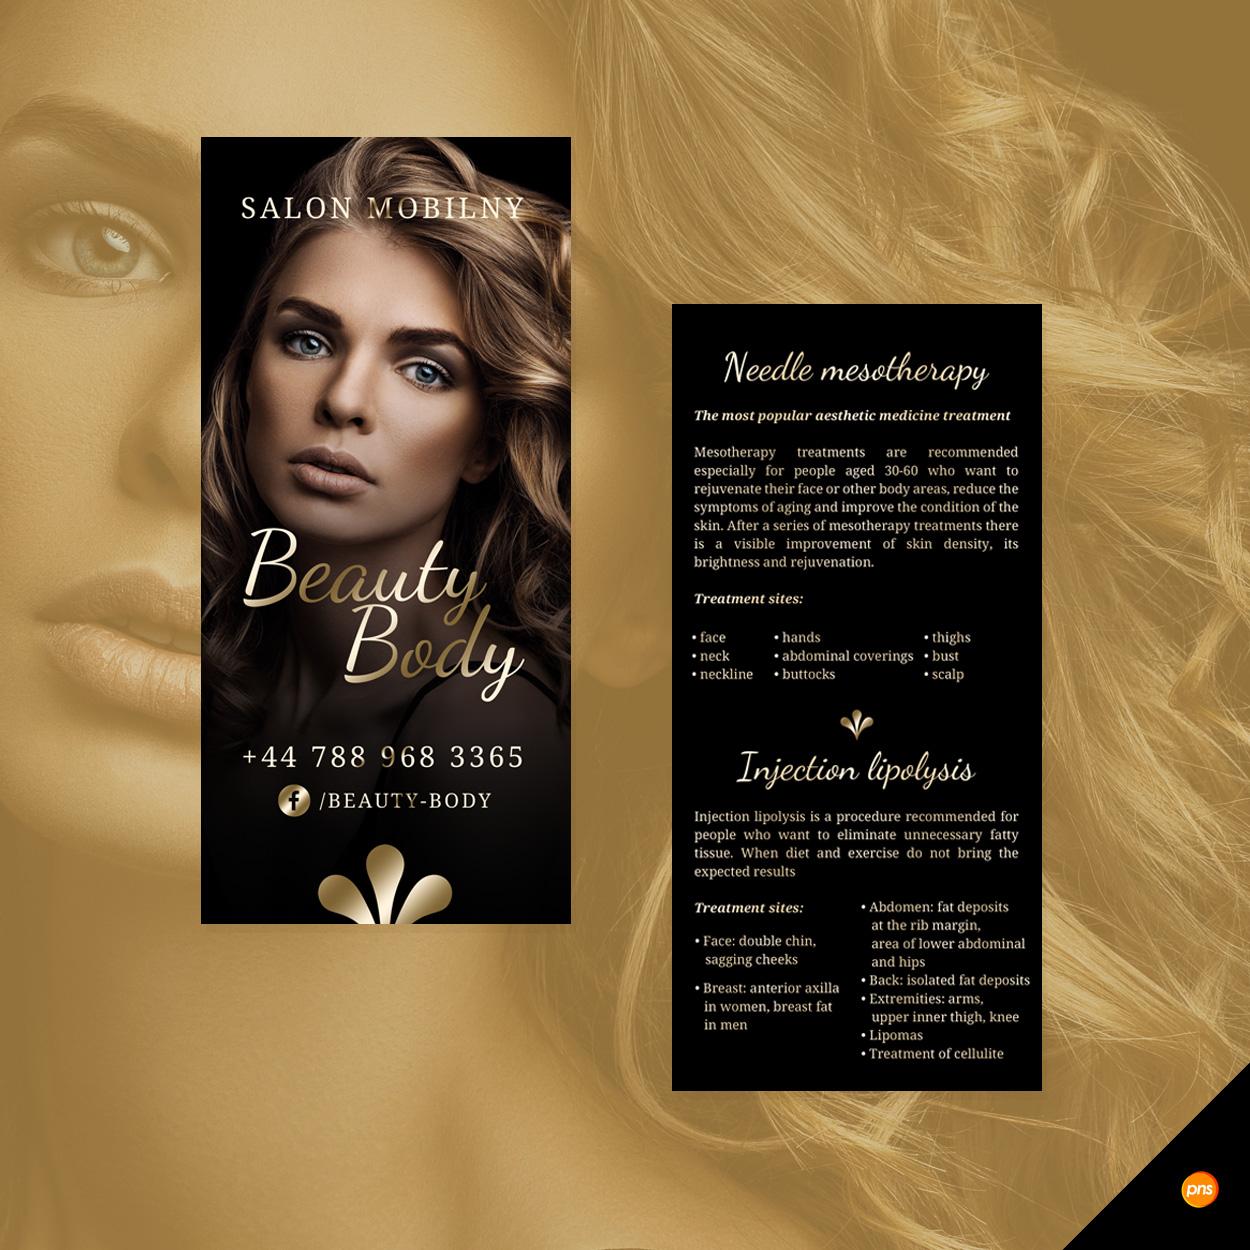 projekt ulotka dl salon kosmetyczny beauty body - Projekt ulotki dla salonu urody - Beauty Body